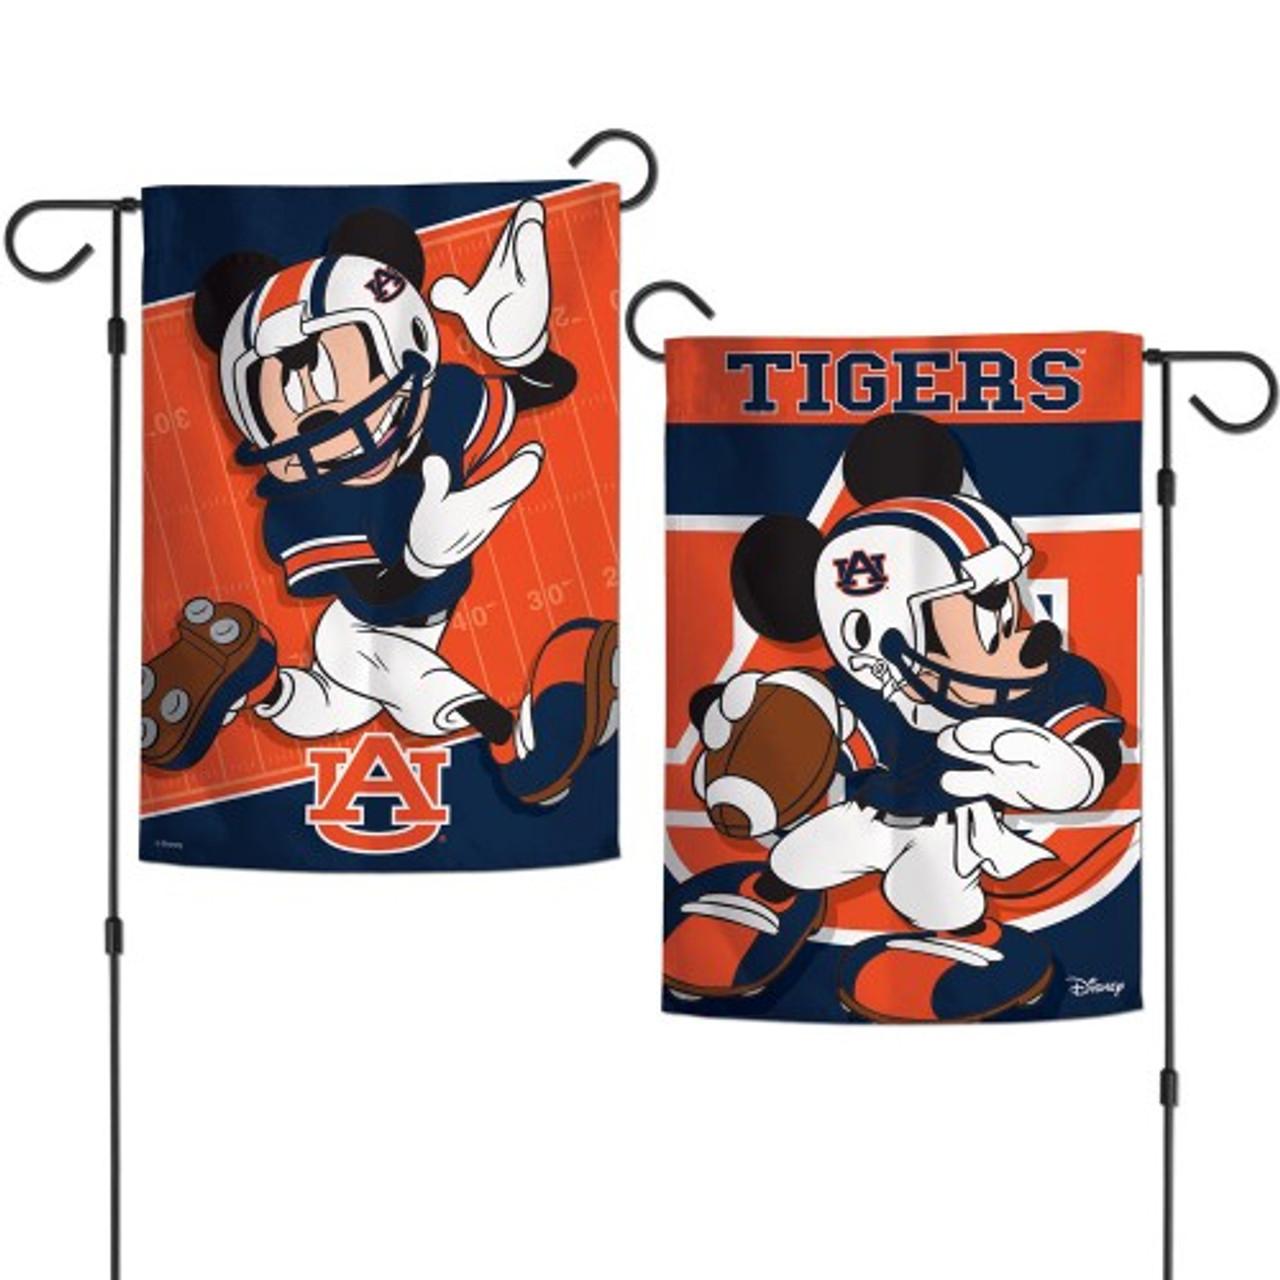 Auburn Tigers Flag 12x18 Garden Style 2 Sided Disney Special Order